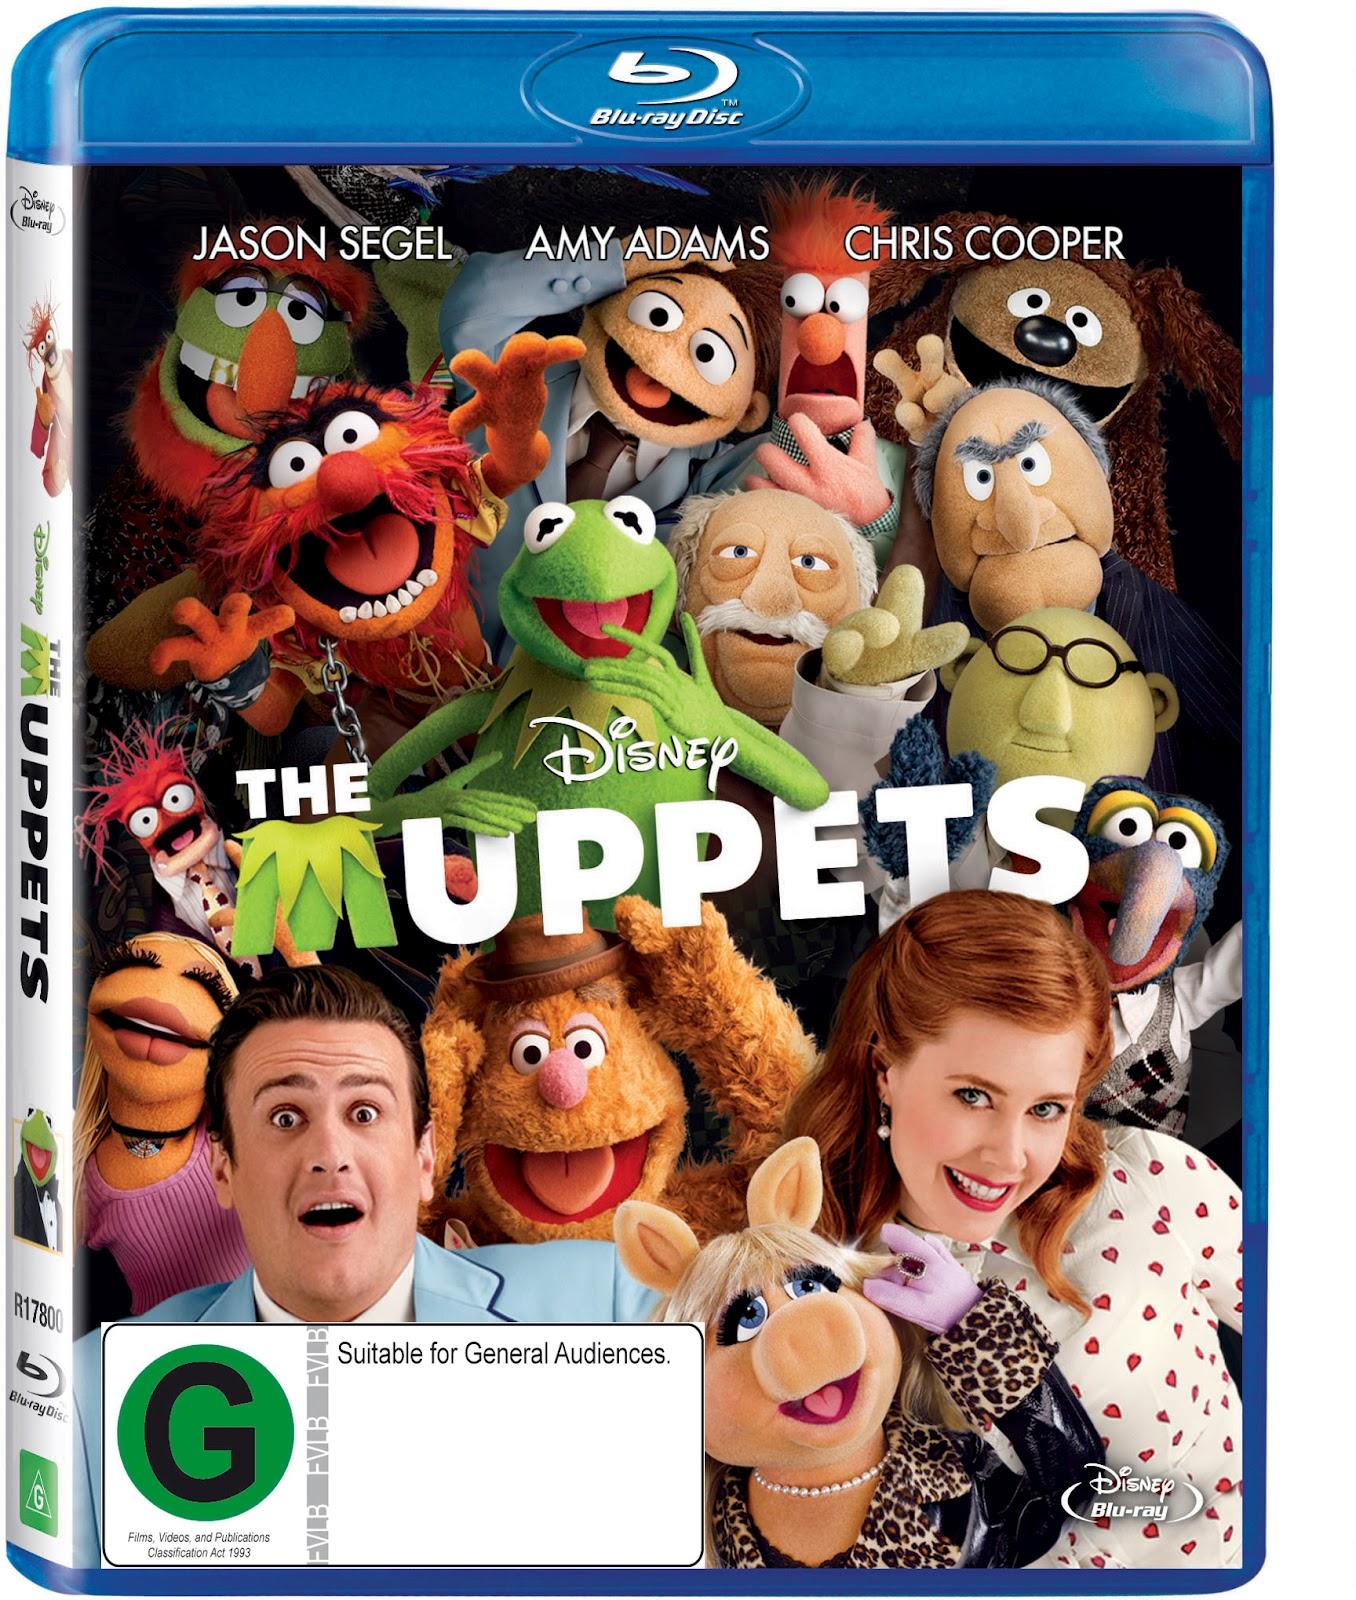 http://1.bp.blogspot.com/-FyGE0fY0UdY/T7nDaMW8yYI/AAAAAAAABR0/B0oLIYsVQac/s1600/Muppets,-The-Single-BD-R178.jpg